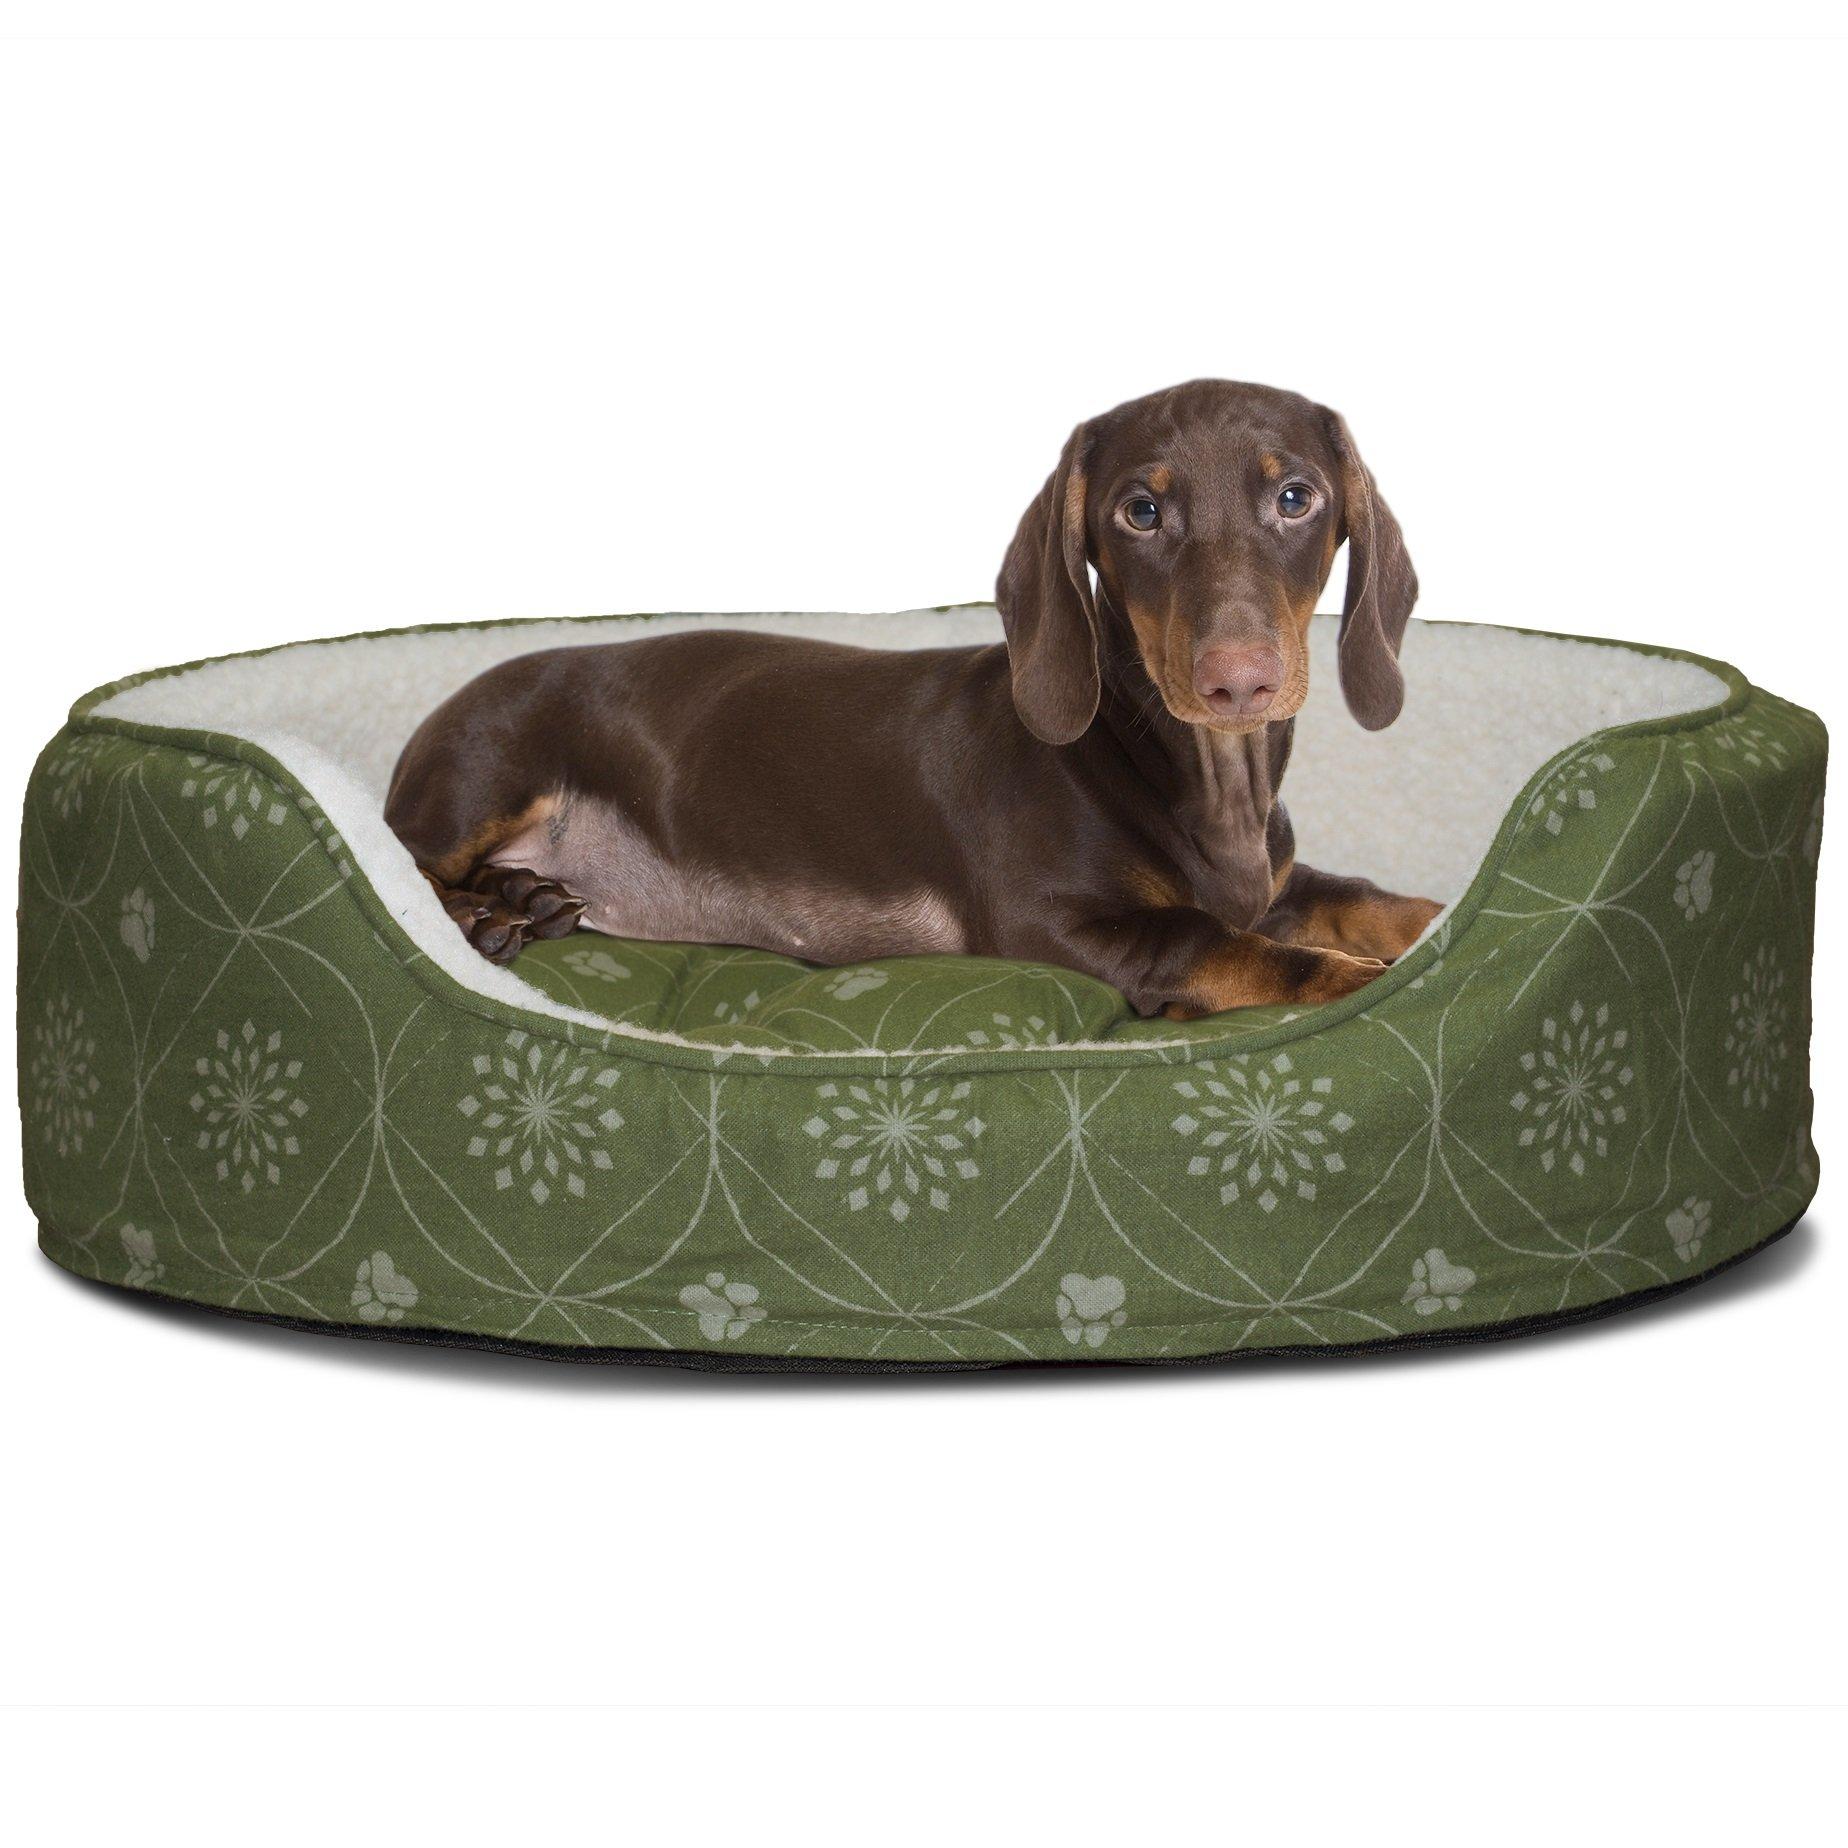 Furhaven Pet Nap Oval Lounger Bed for Dog or Cat Jade Green MEDIUM